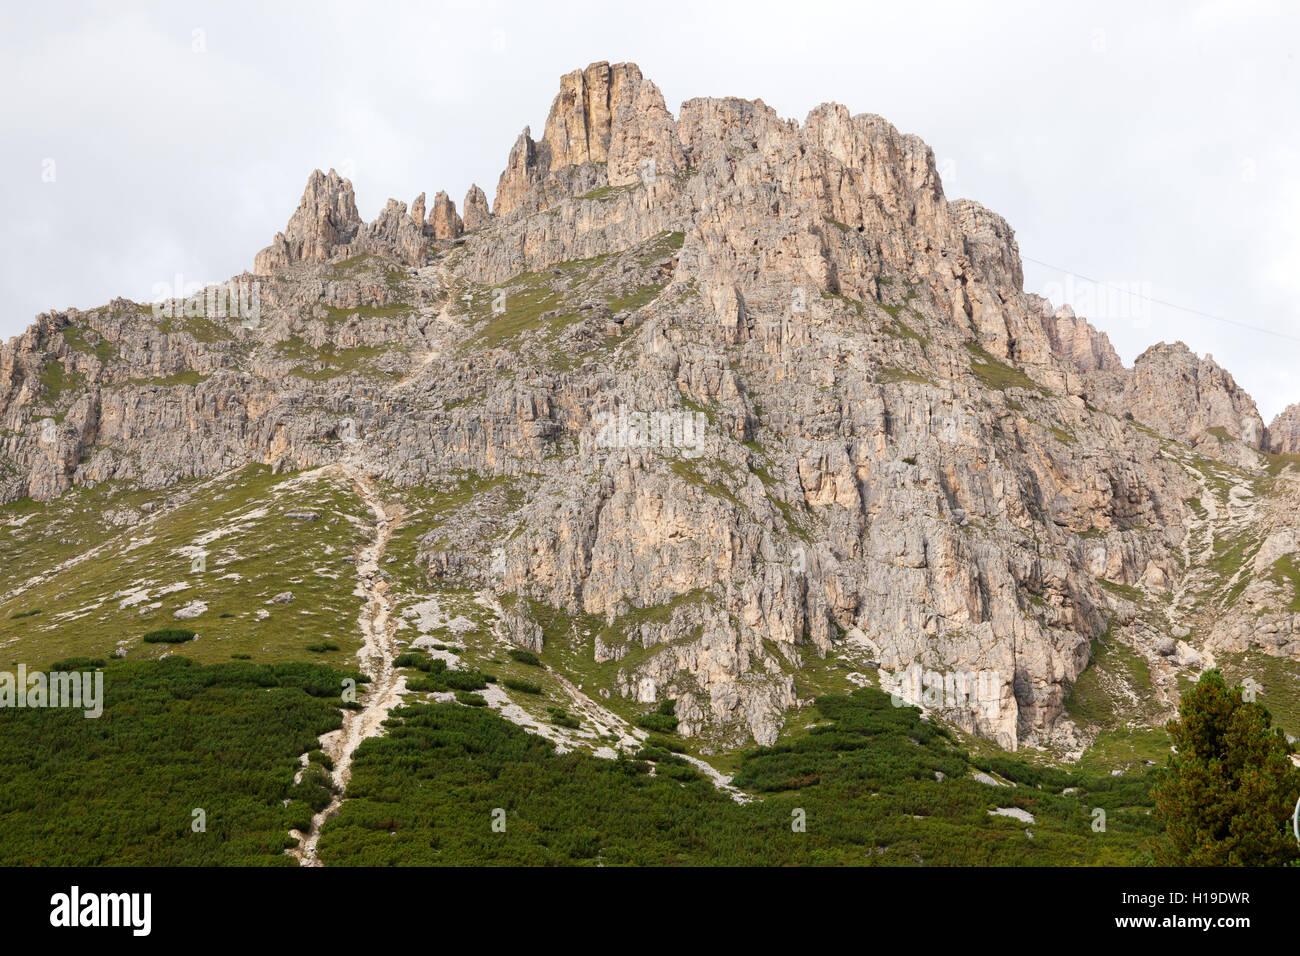 Dolomites Mountains. - Stock Image